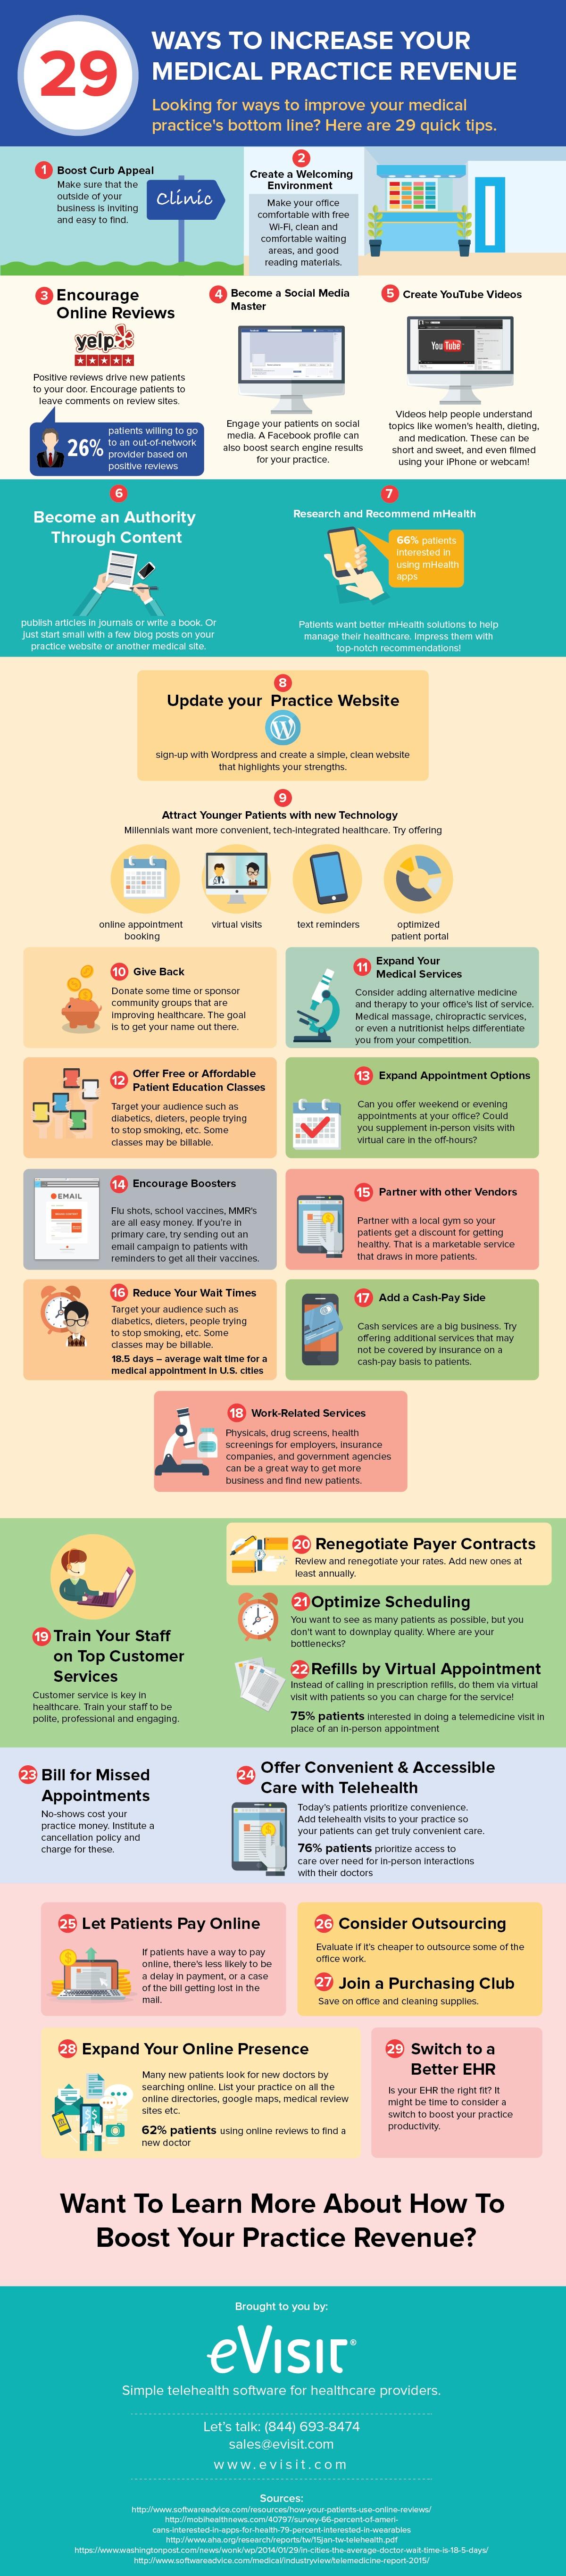 29 ways to boost practice revenue infographic